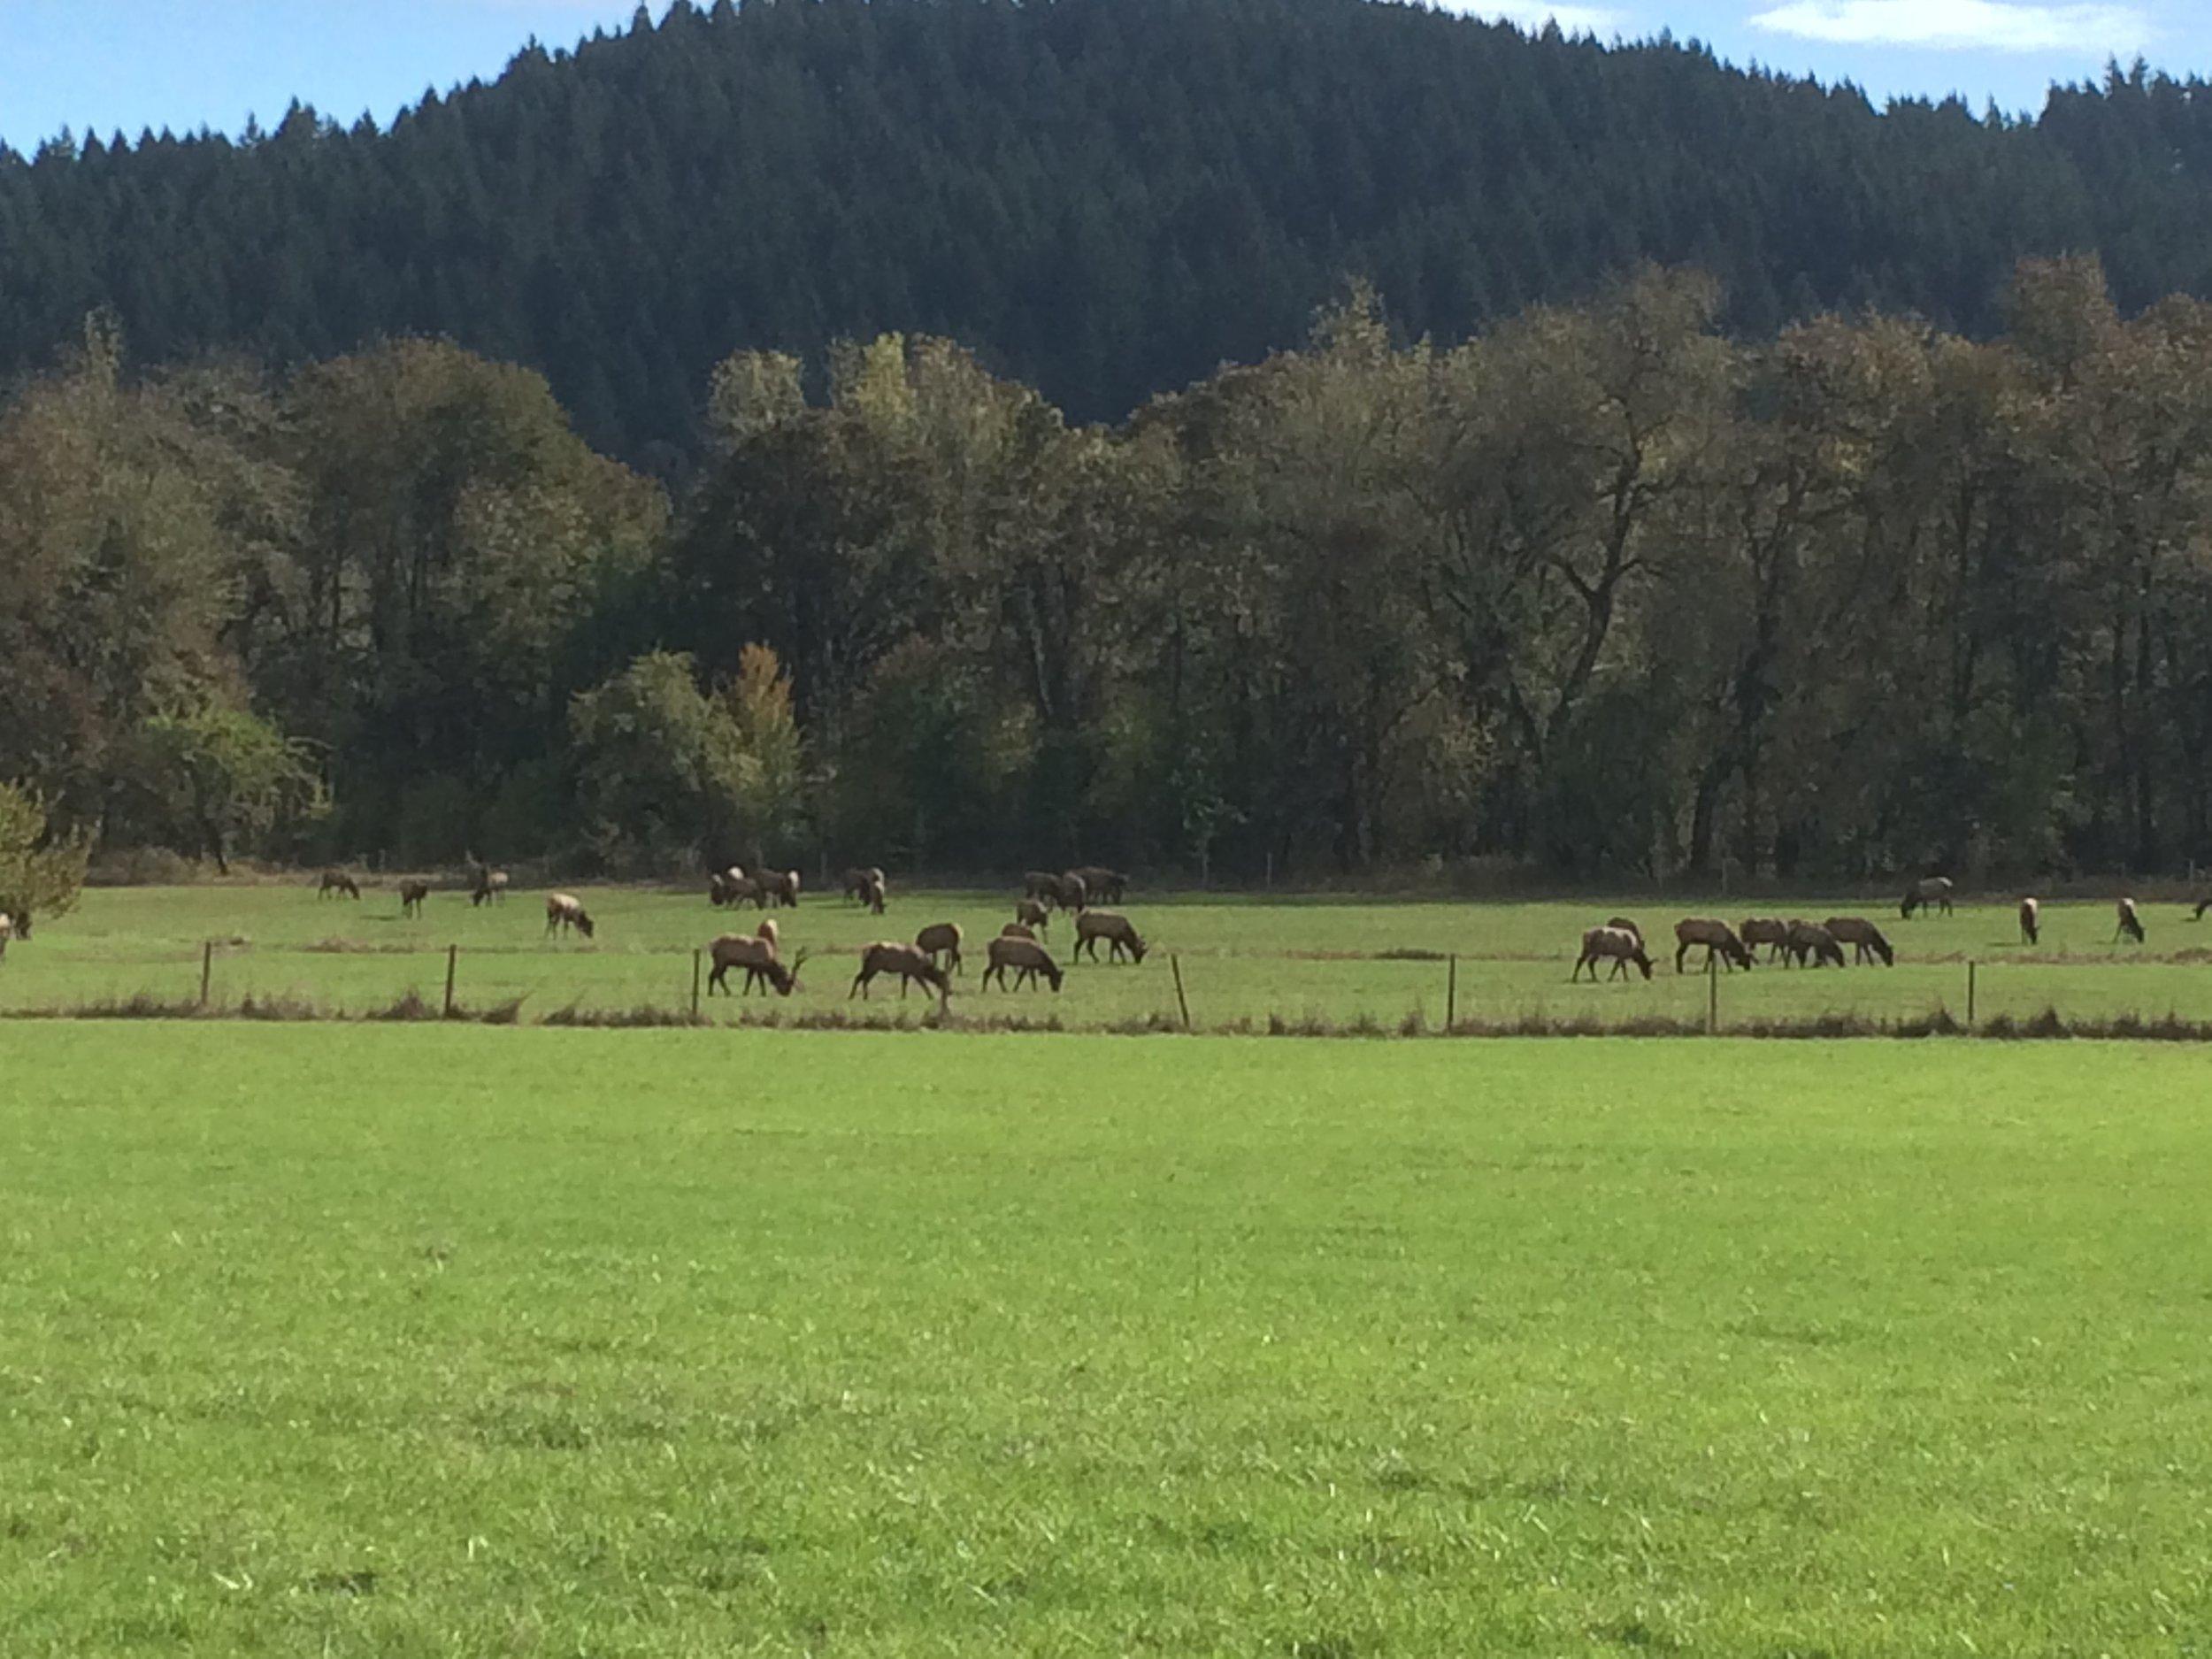 Roosevelt Elk in the Oregon Coast Range.